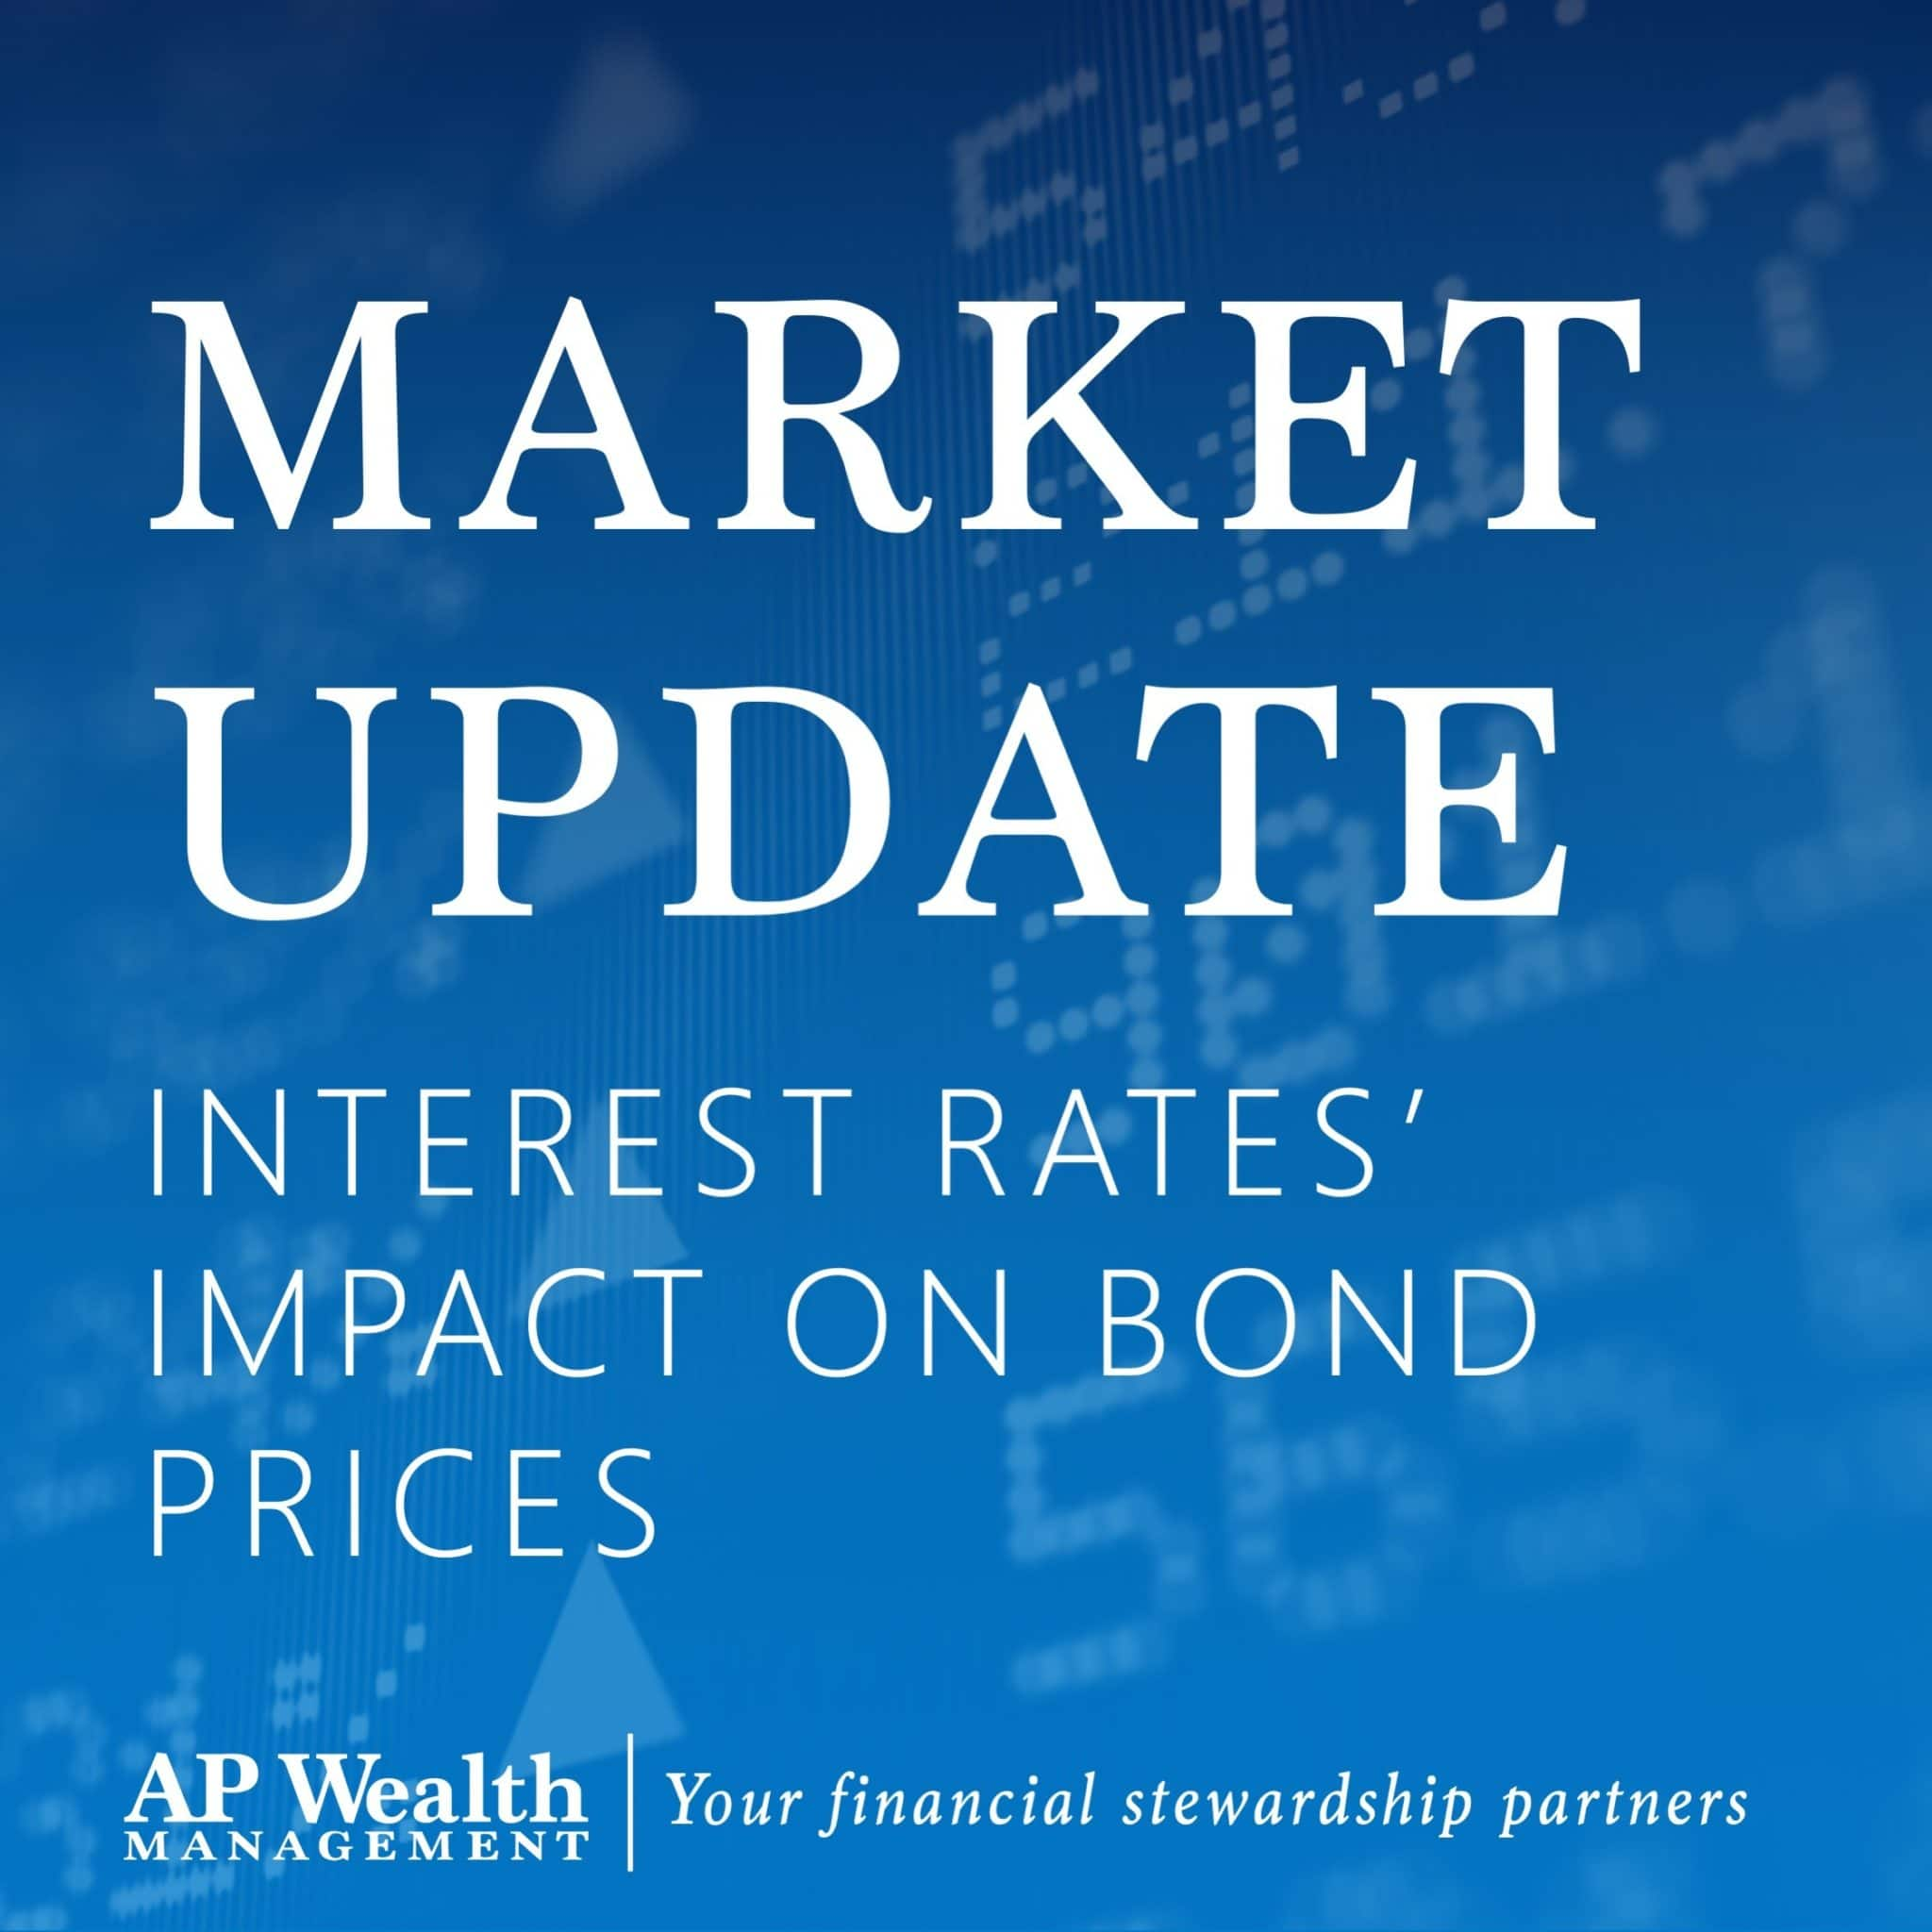 Interest Rates Impact on Bond Prices